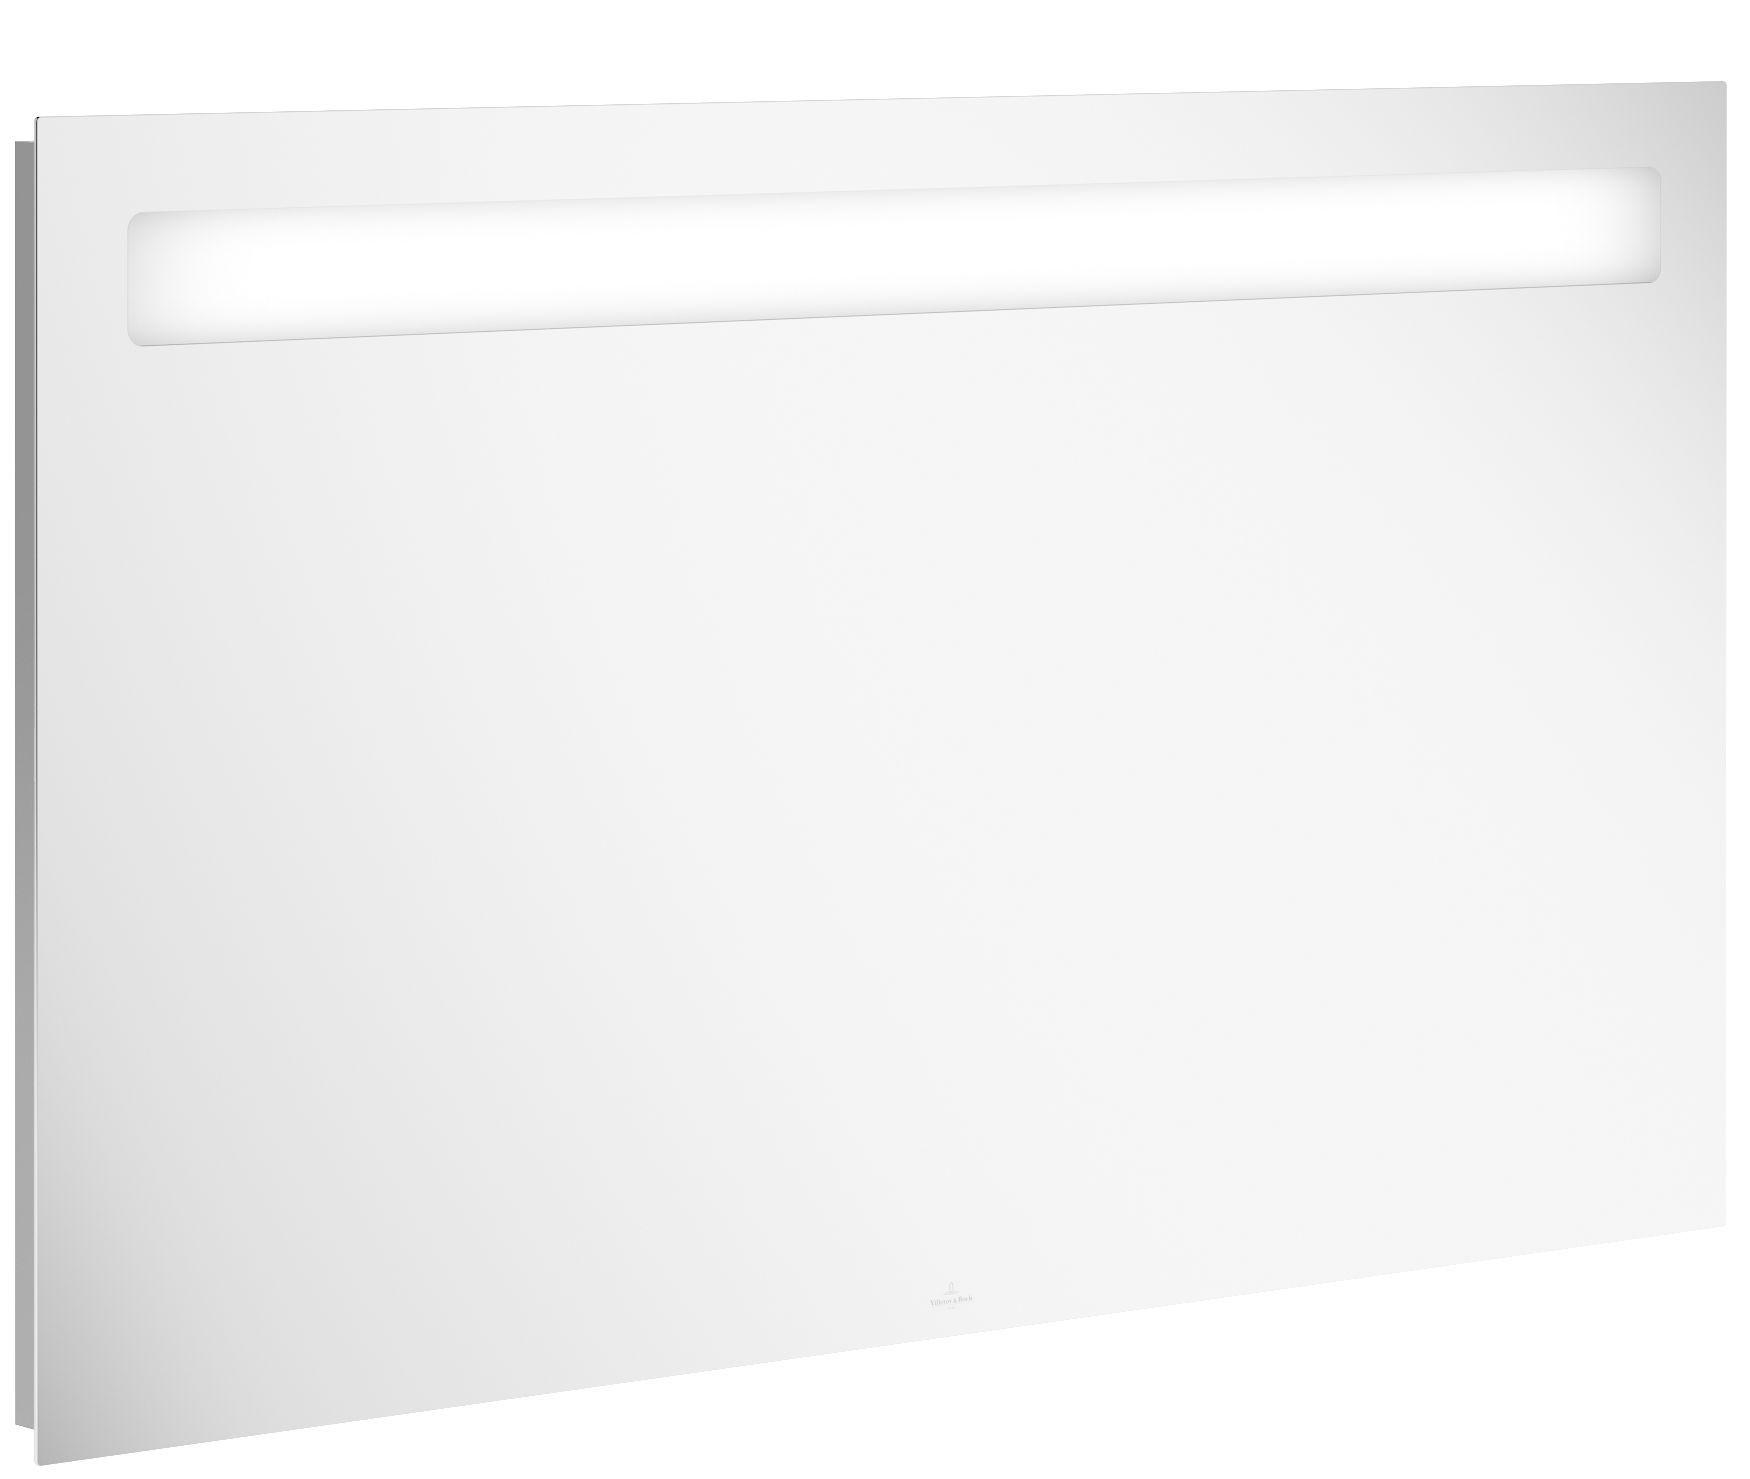 Villeroy & Boch More to See 14 Spiegel mit Beleuchtung  B:100xH:75xT:4,7cm A4321000